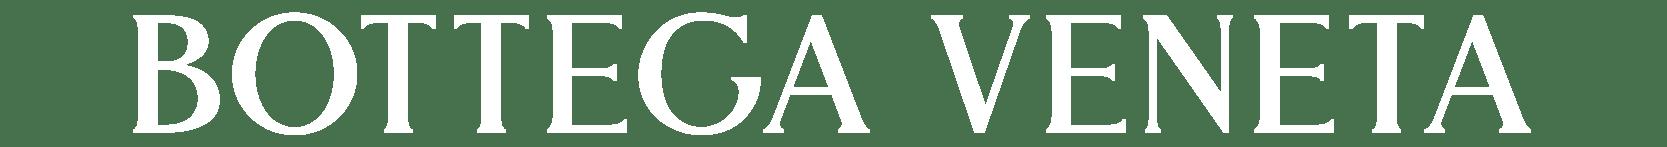 Logo Brand Bottega Veneta